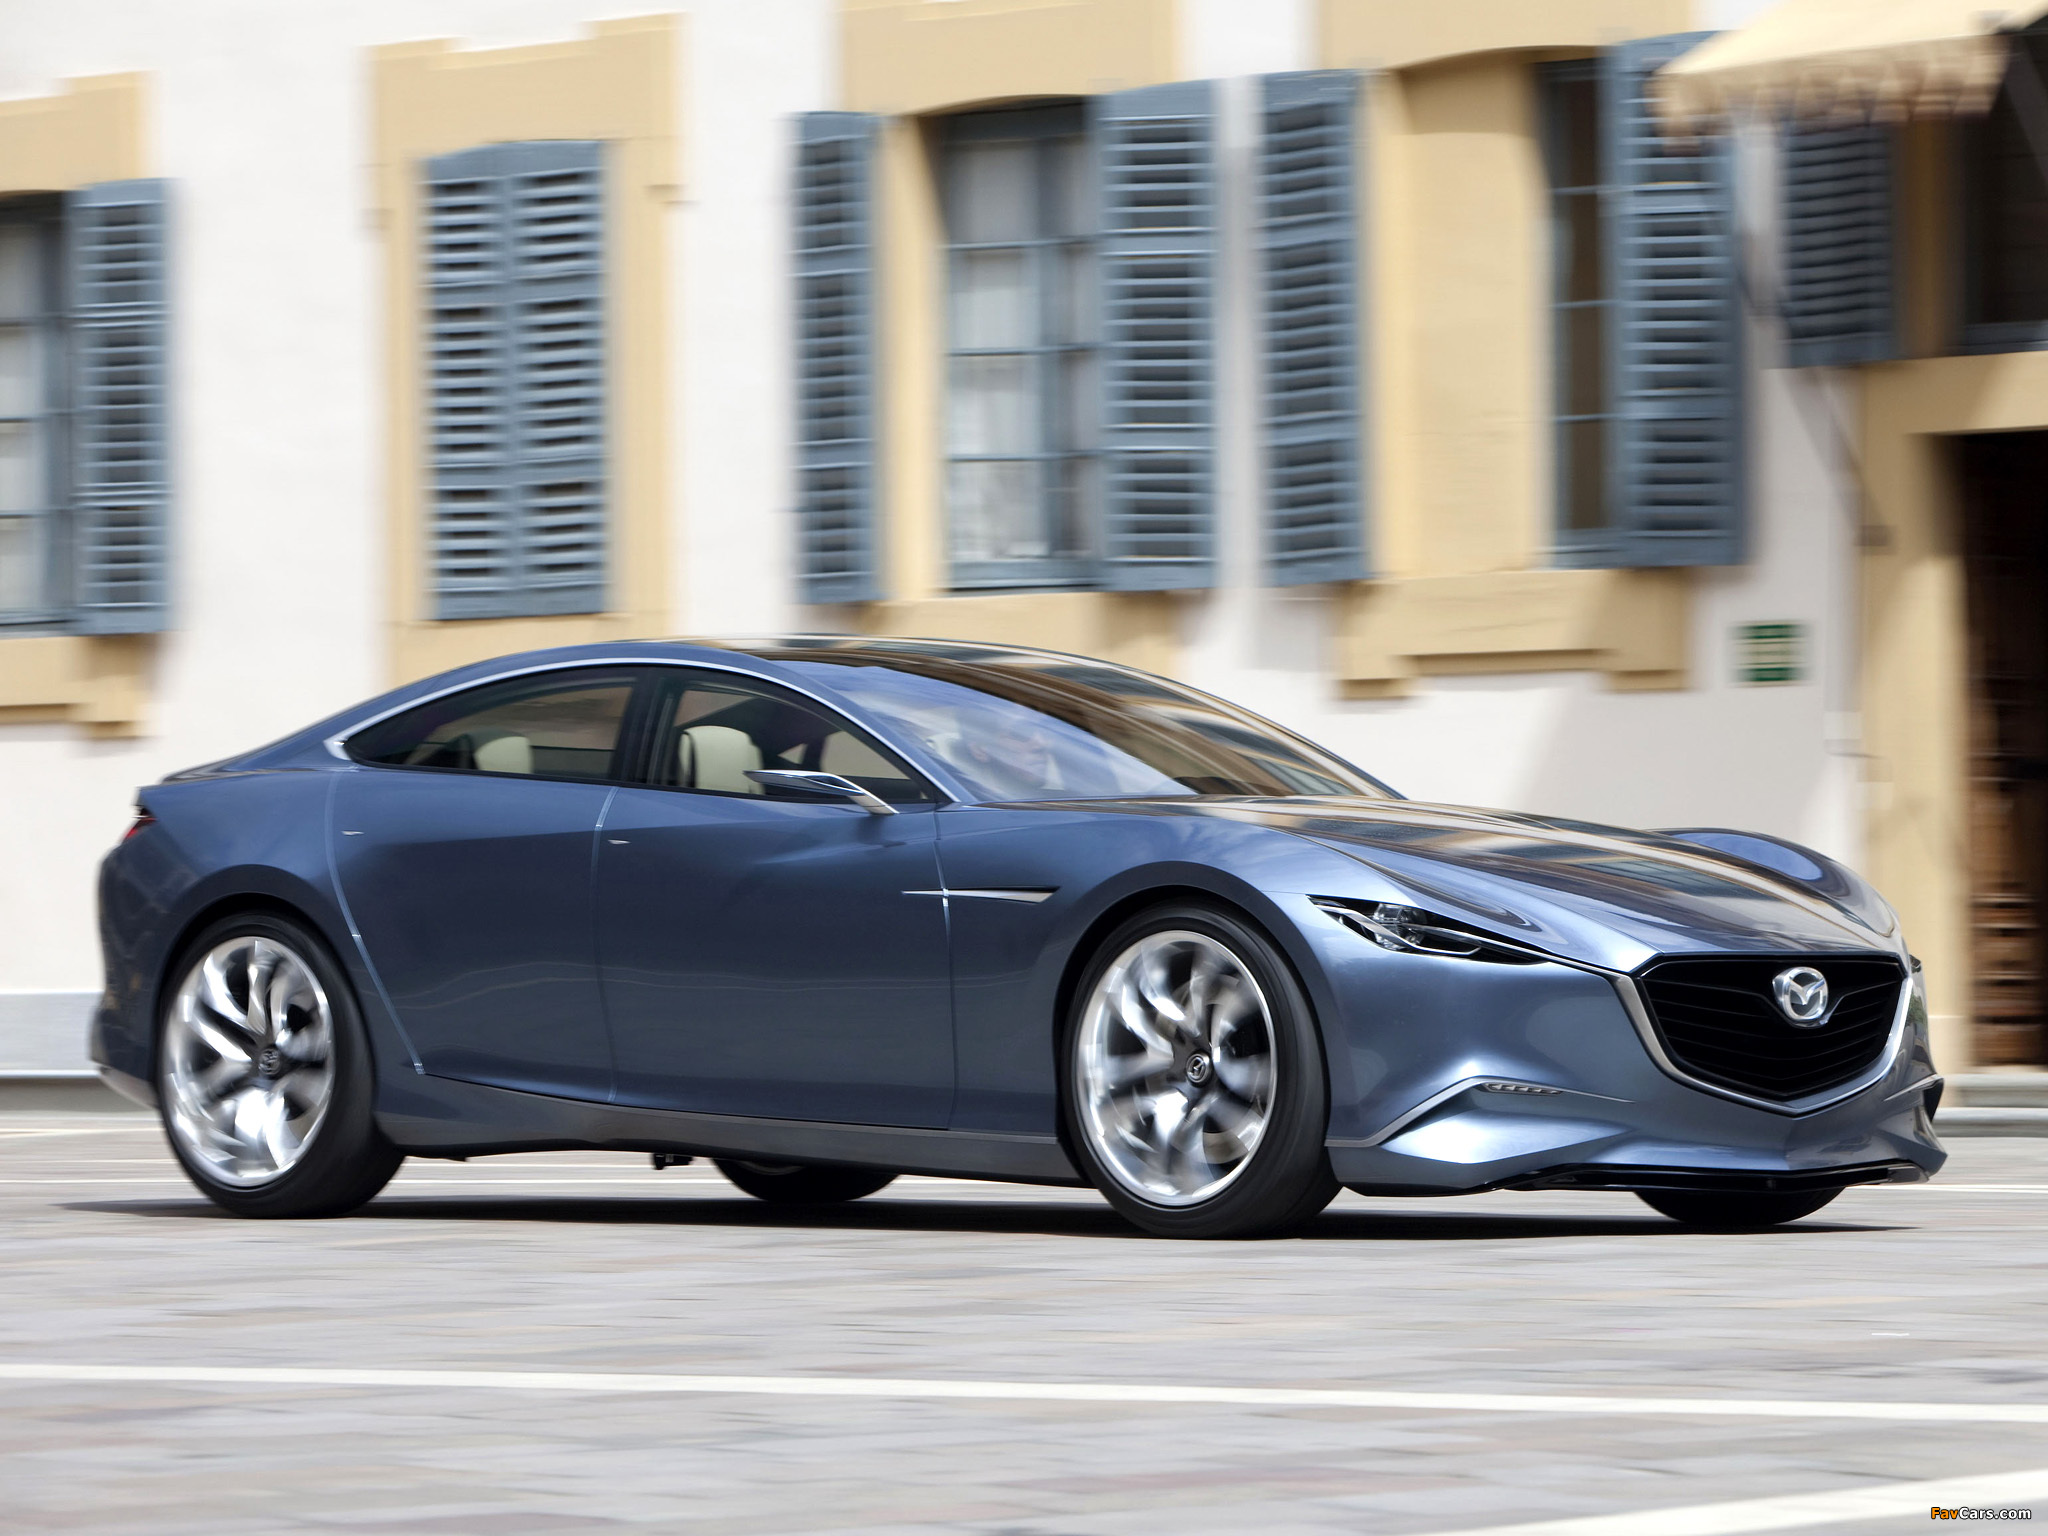 Kekurangan Mazda Shinari Perbandingan Harga